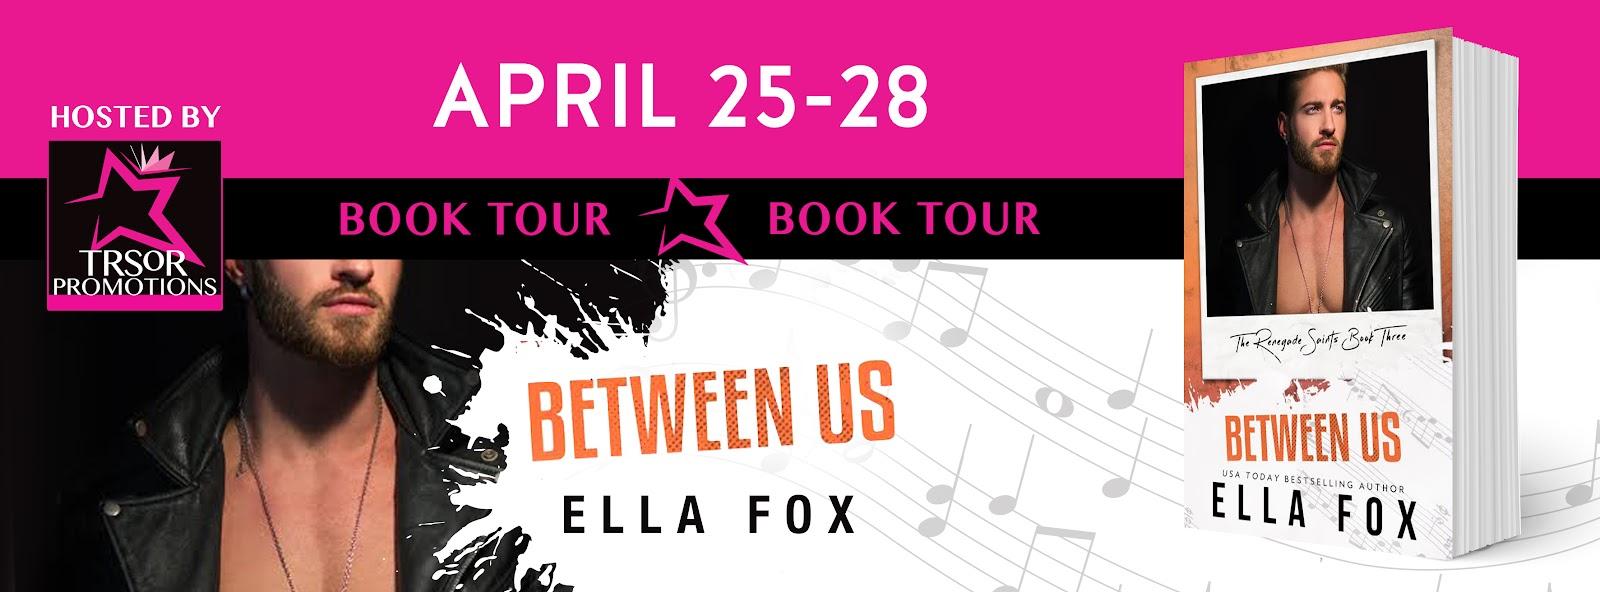 BETWEEN US_BOOK_TOUR.jpg